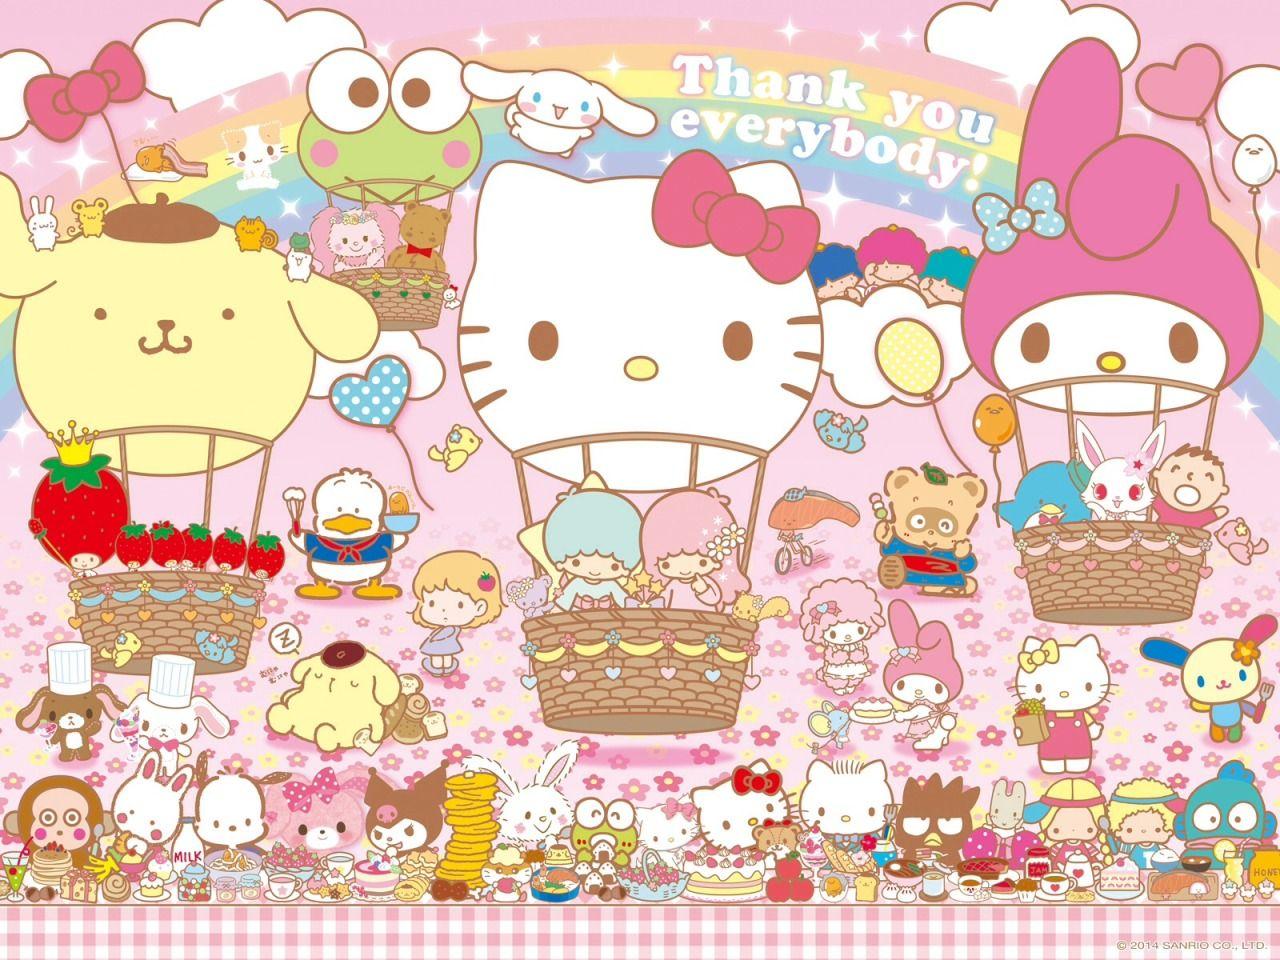 Sanrio & Balloons--the best combination ever!!!!! o(^▽^)o KawaiiBox.com ❤ The Cutest Subscription Box